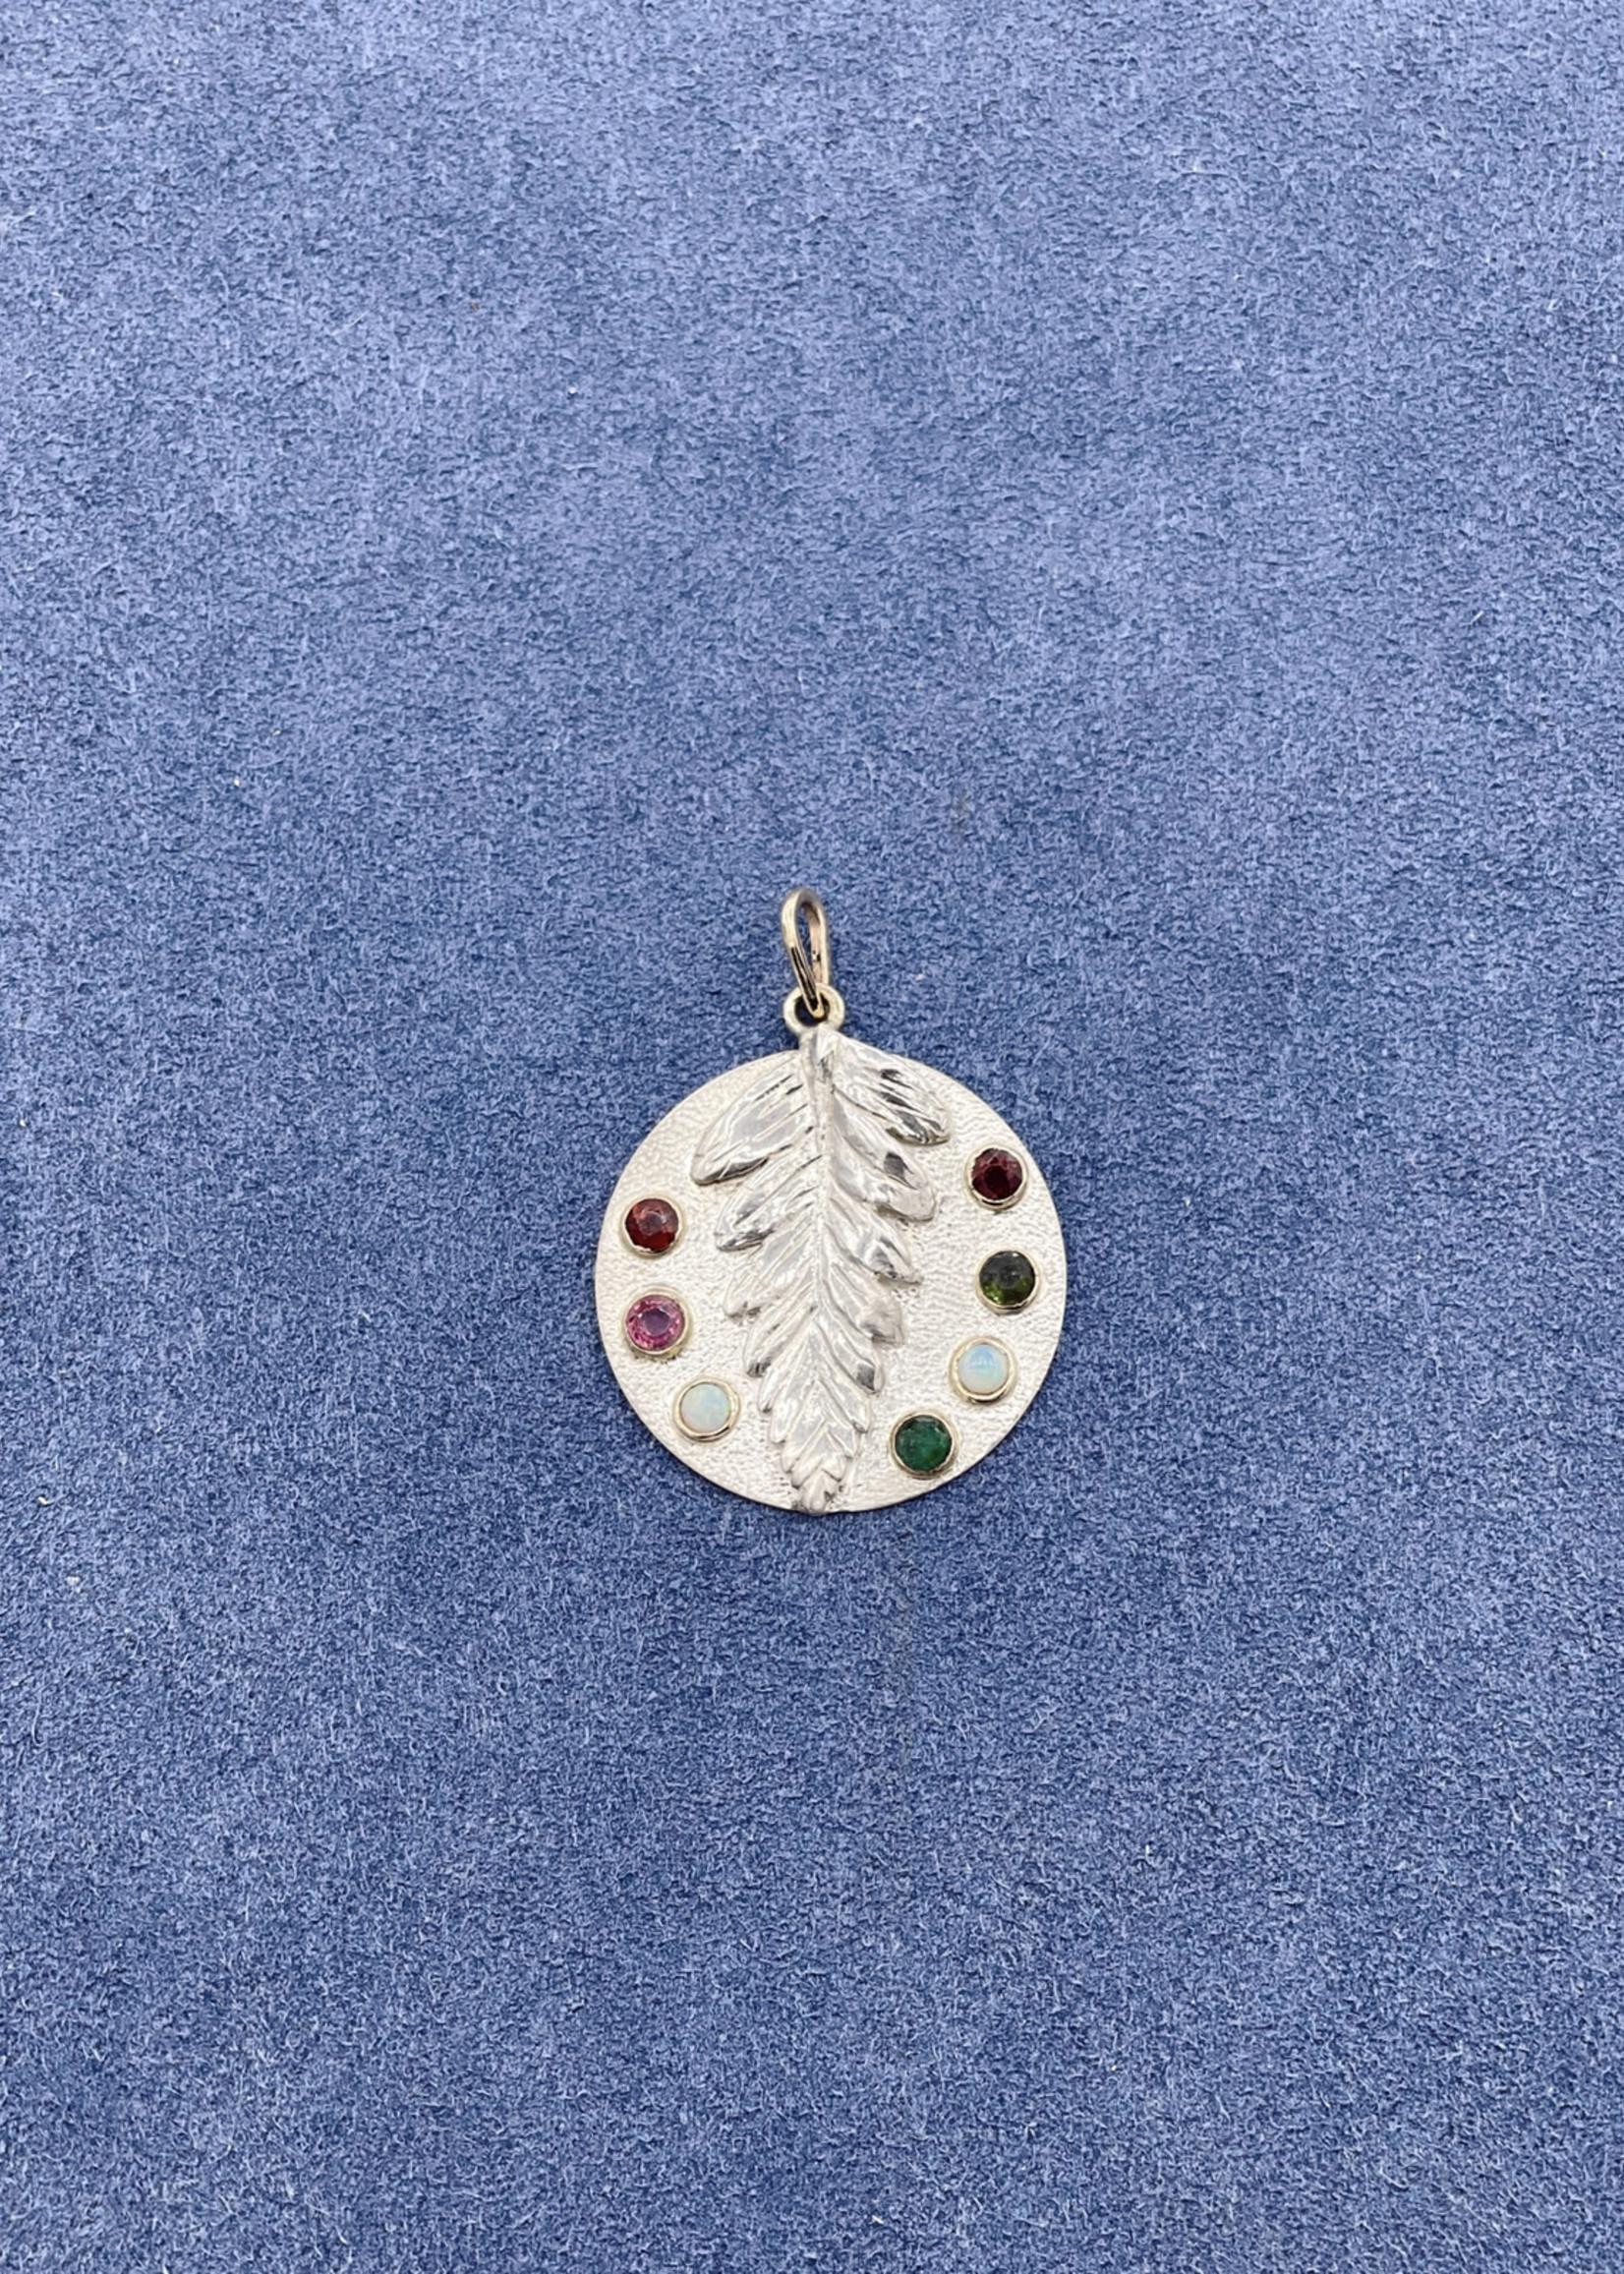 CJ Designs Leaf Pendant with Multi Gems